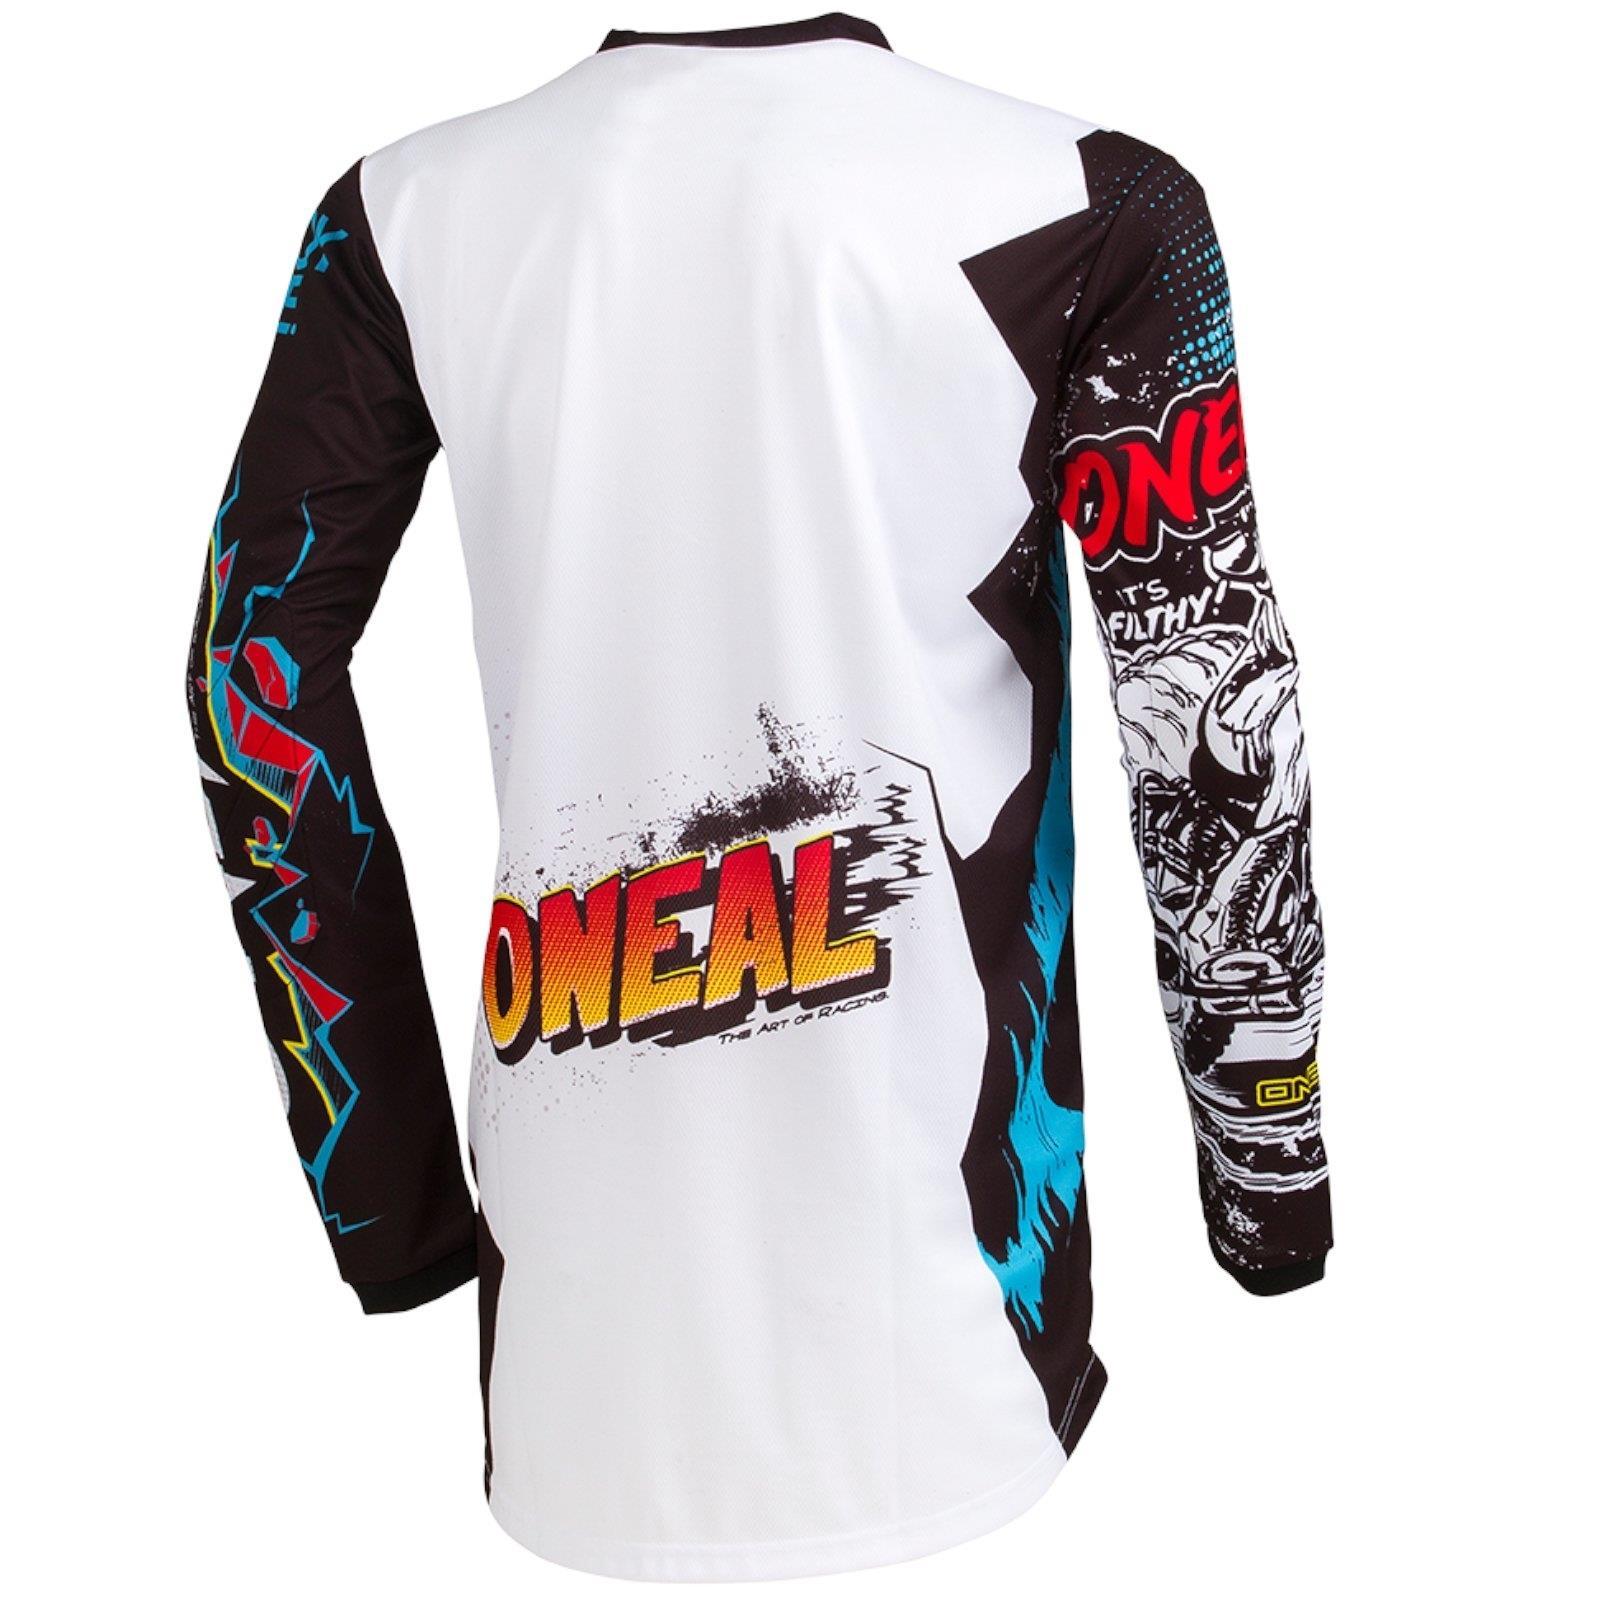 O-039-Neal-elemento-Villain-Motocross-Jersey-Enduro-MX-MTB-FR-DH-MAGLIA-MOUNTAIN-BIKE miniatura 11